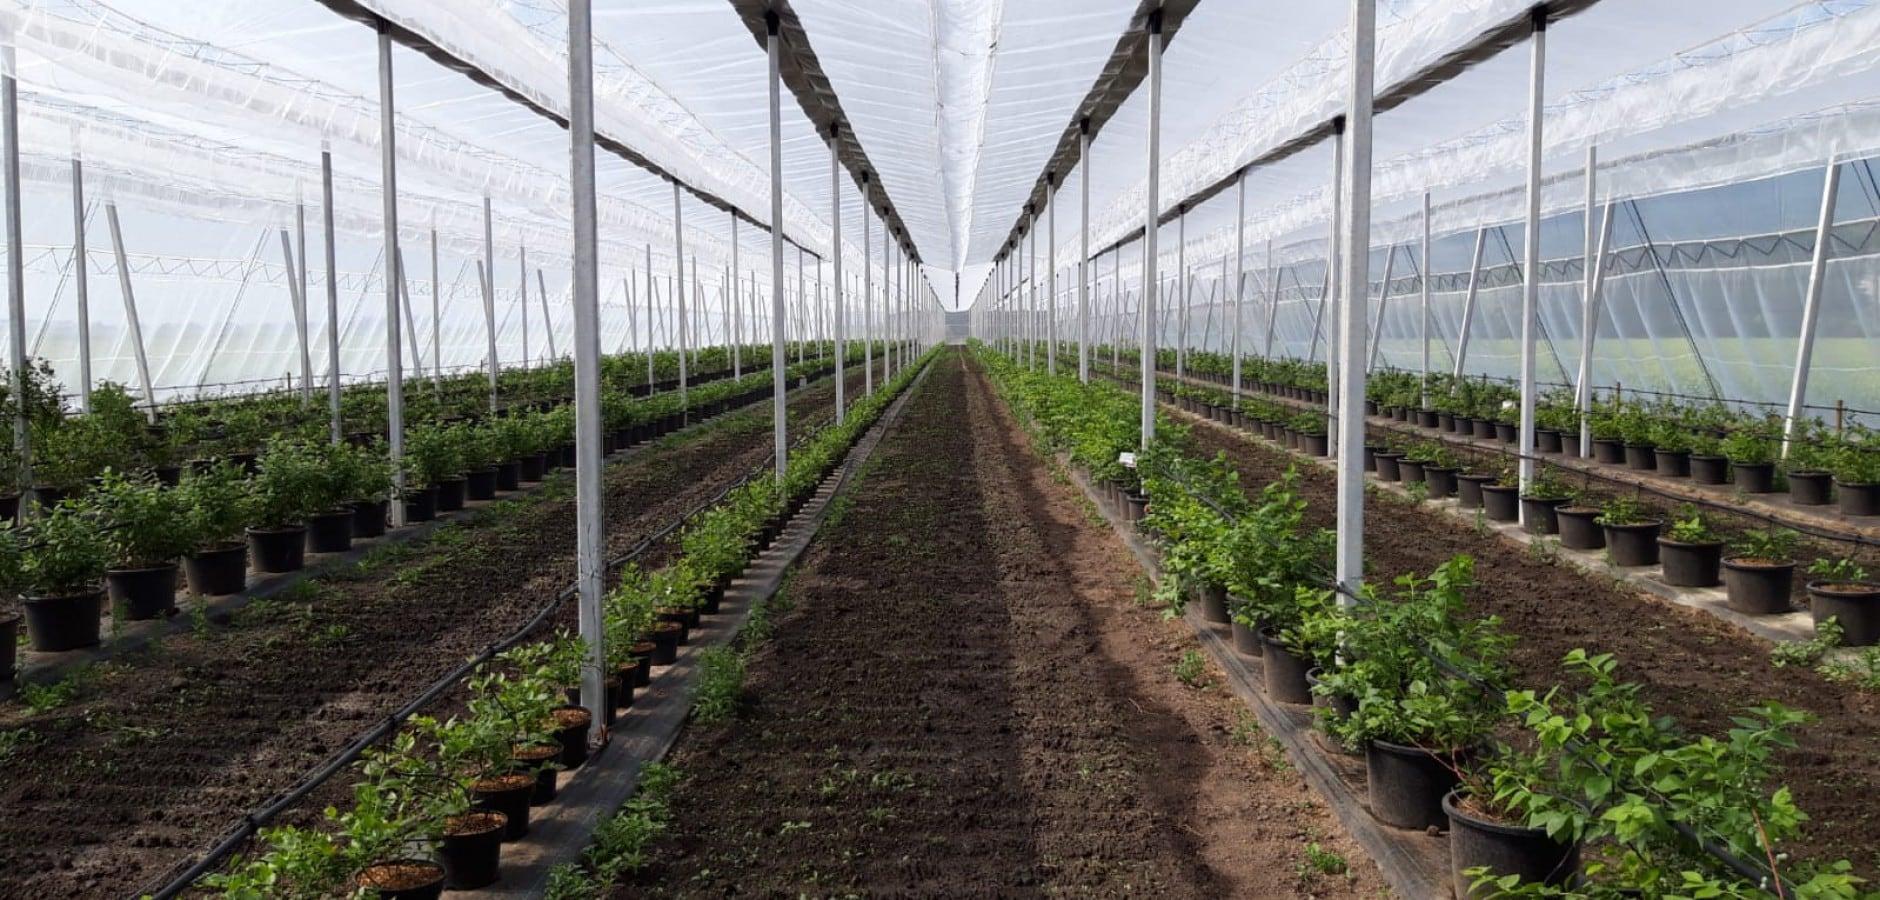 Tunnel and greenhouse foil in Gelderland